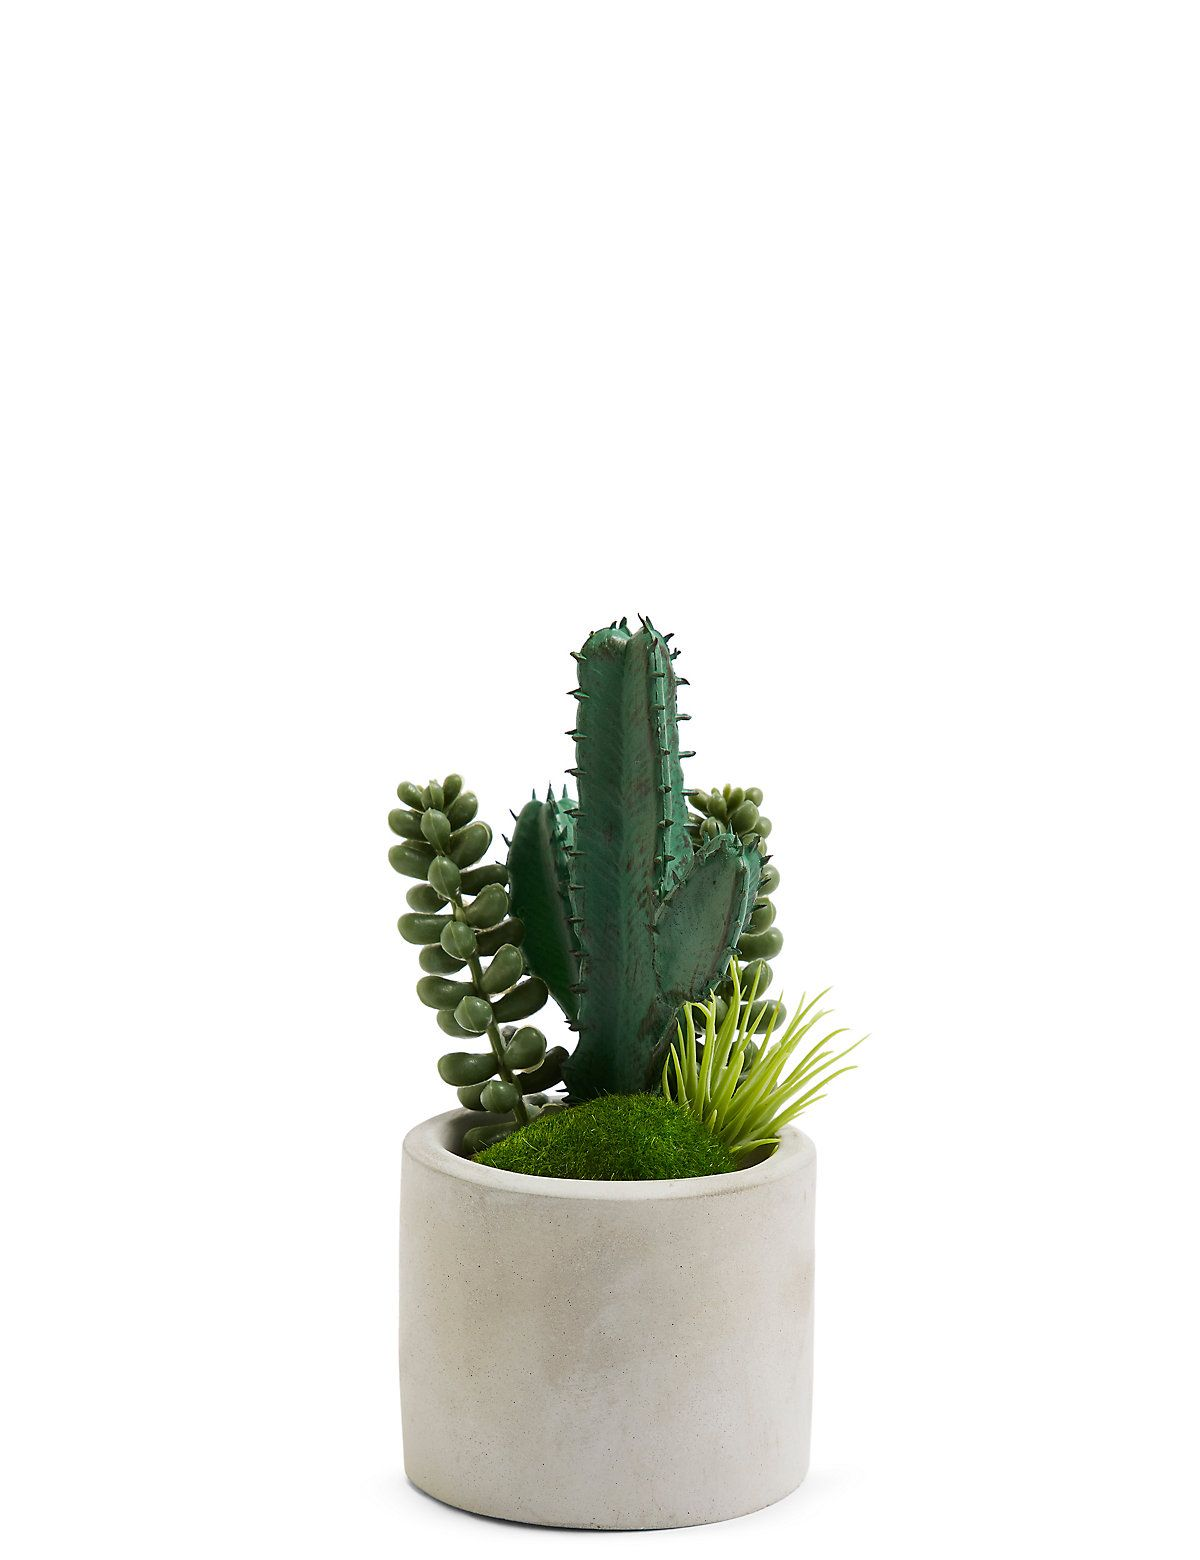 Pagectrl Pagedata Name Small Cactus Cactus P*T Cactus 400 x 300